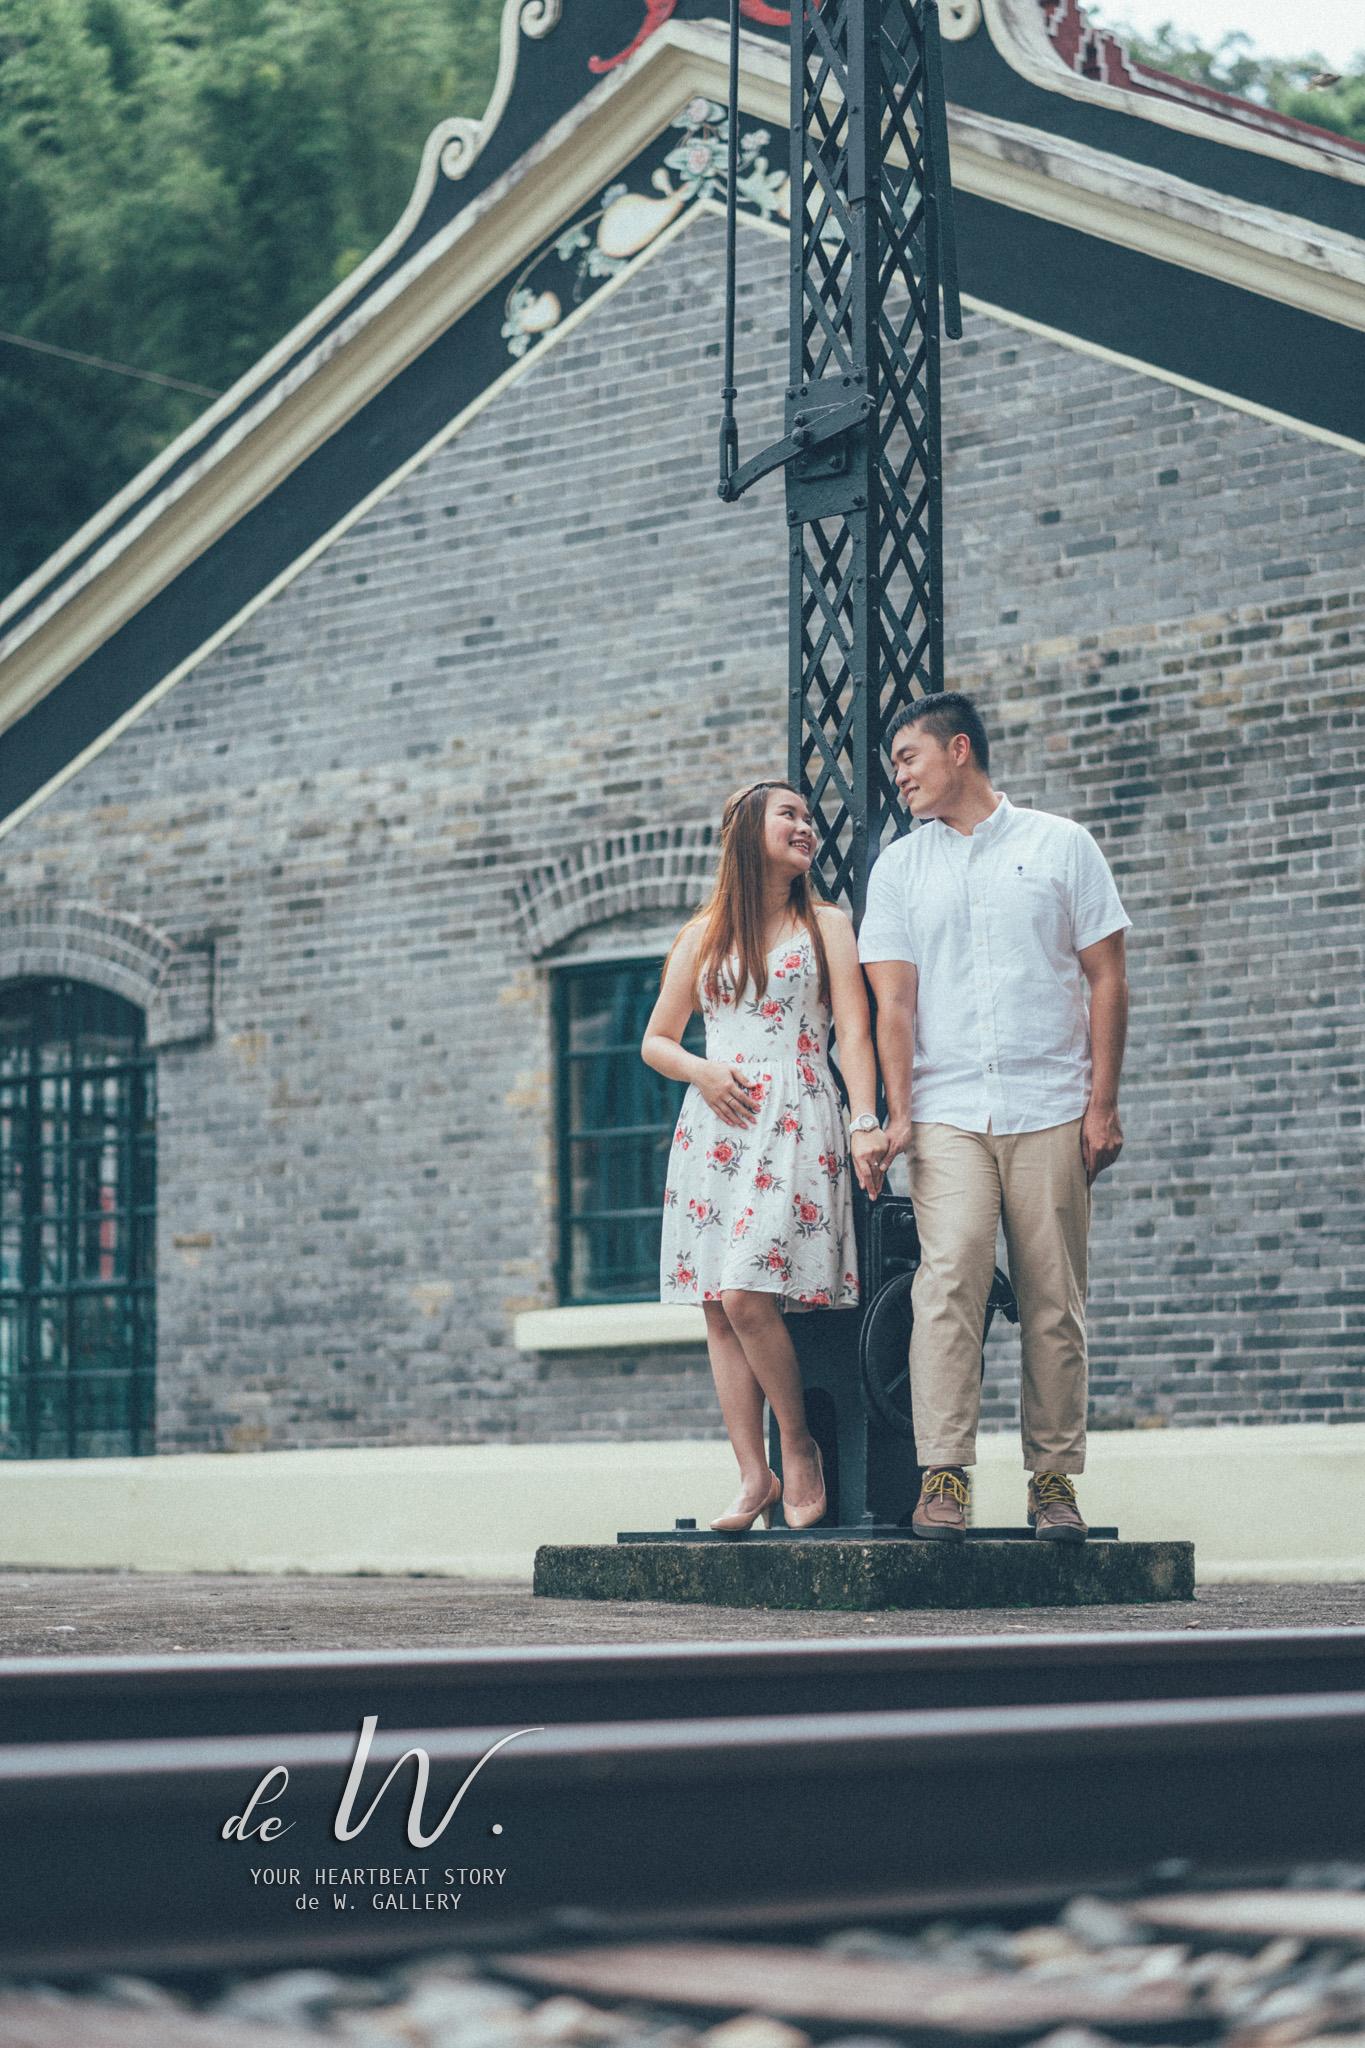 film style story teller de w gallery top10 destination wedding 大埔 火車 2048-037